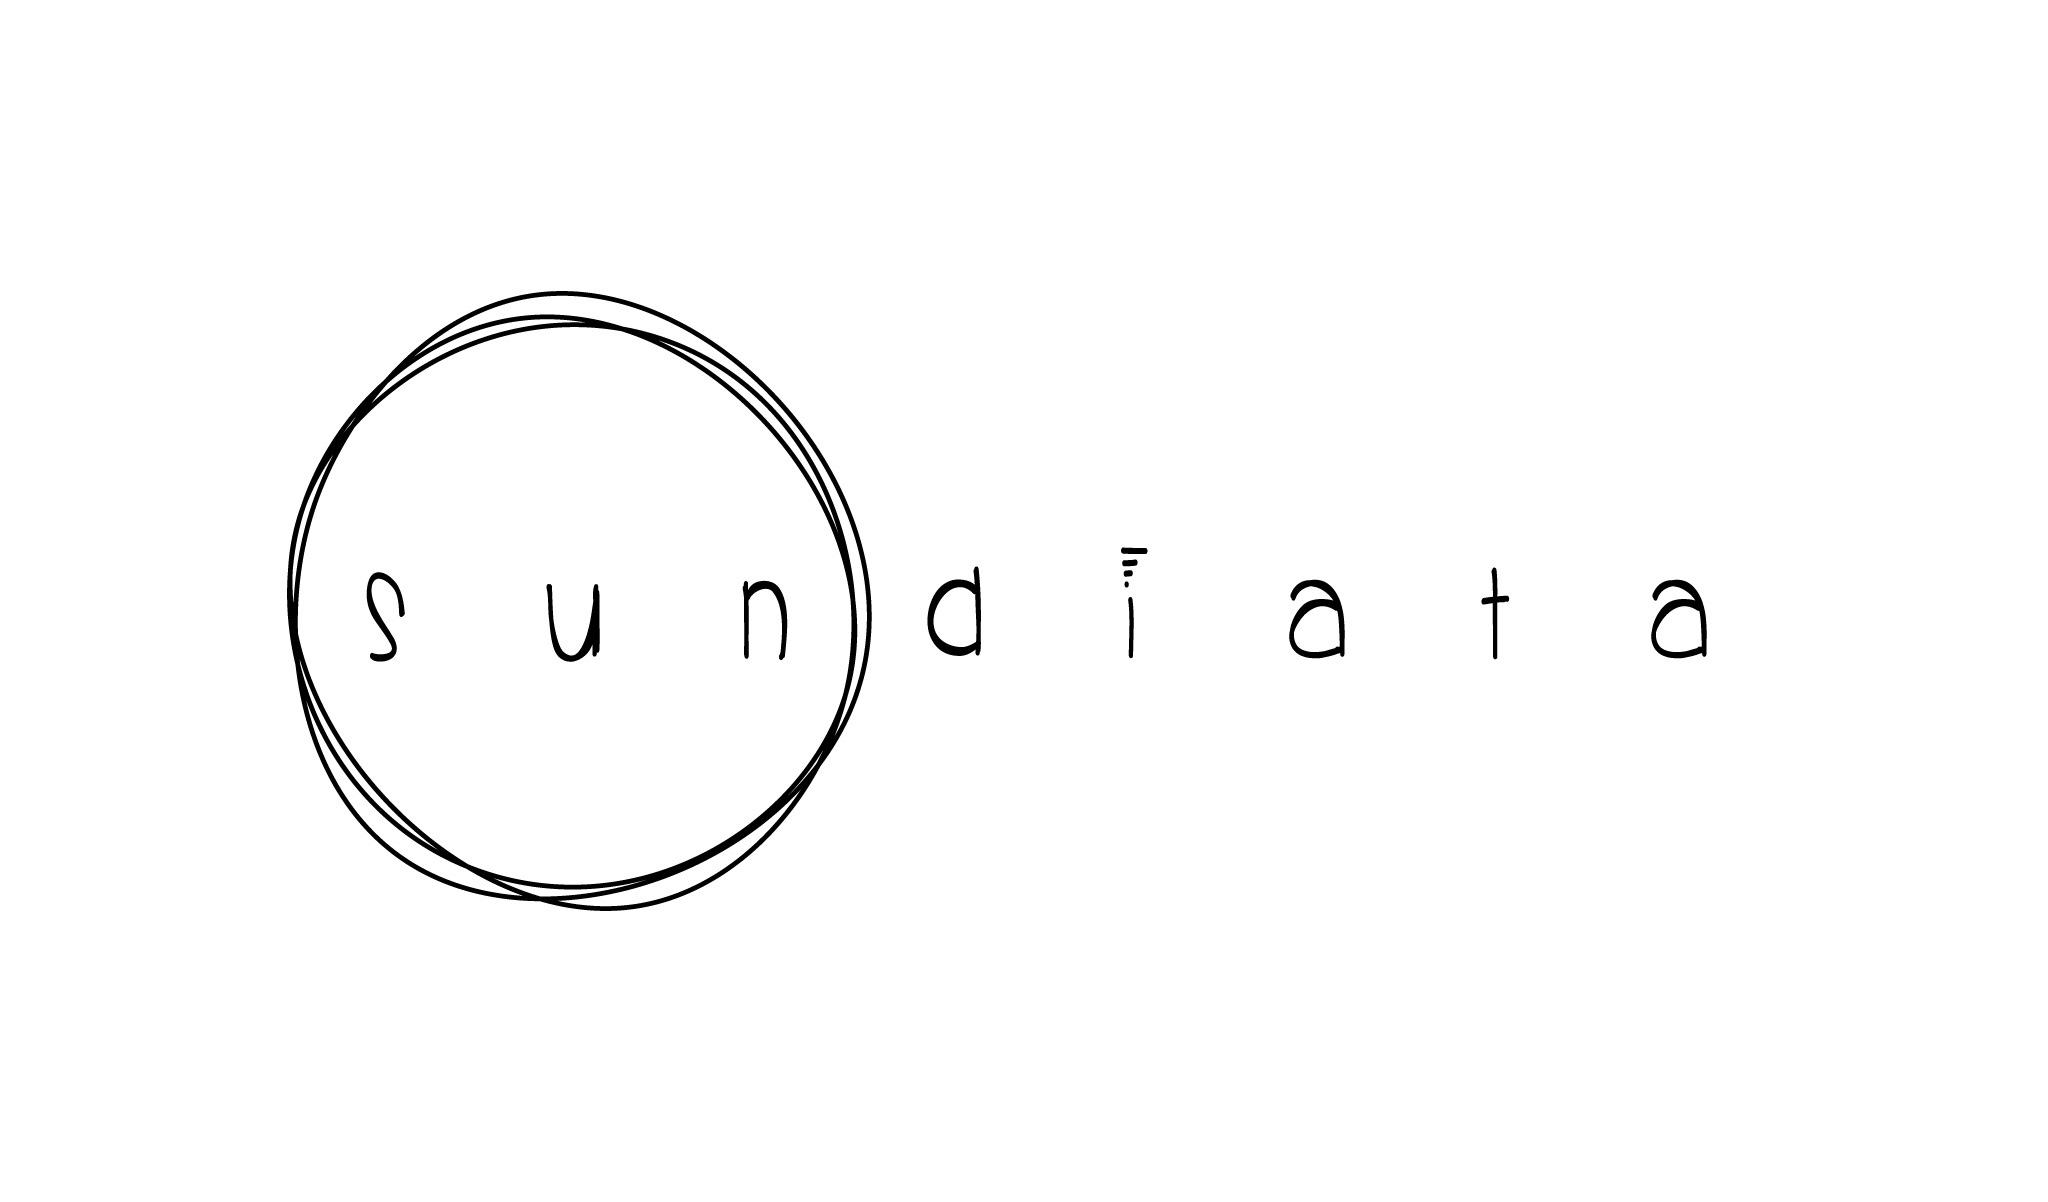 sundiata_black-2